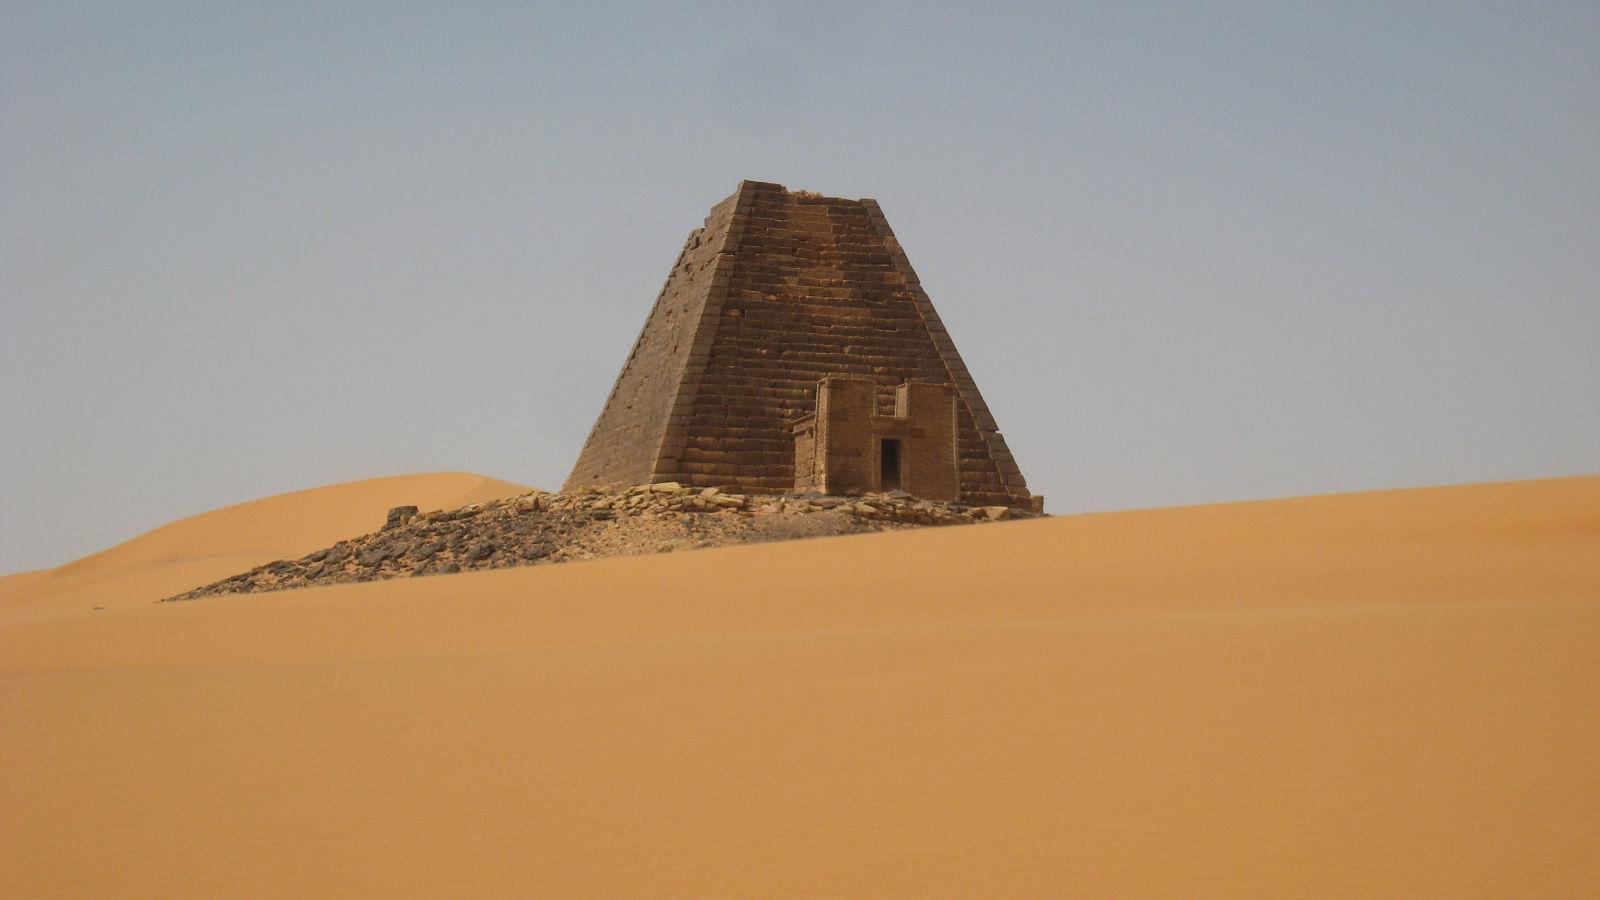 how to get into sand kingdom pyramid